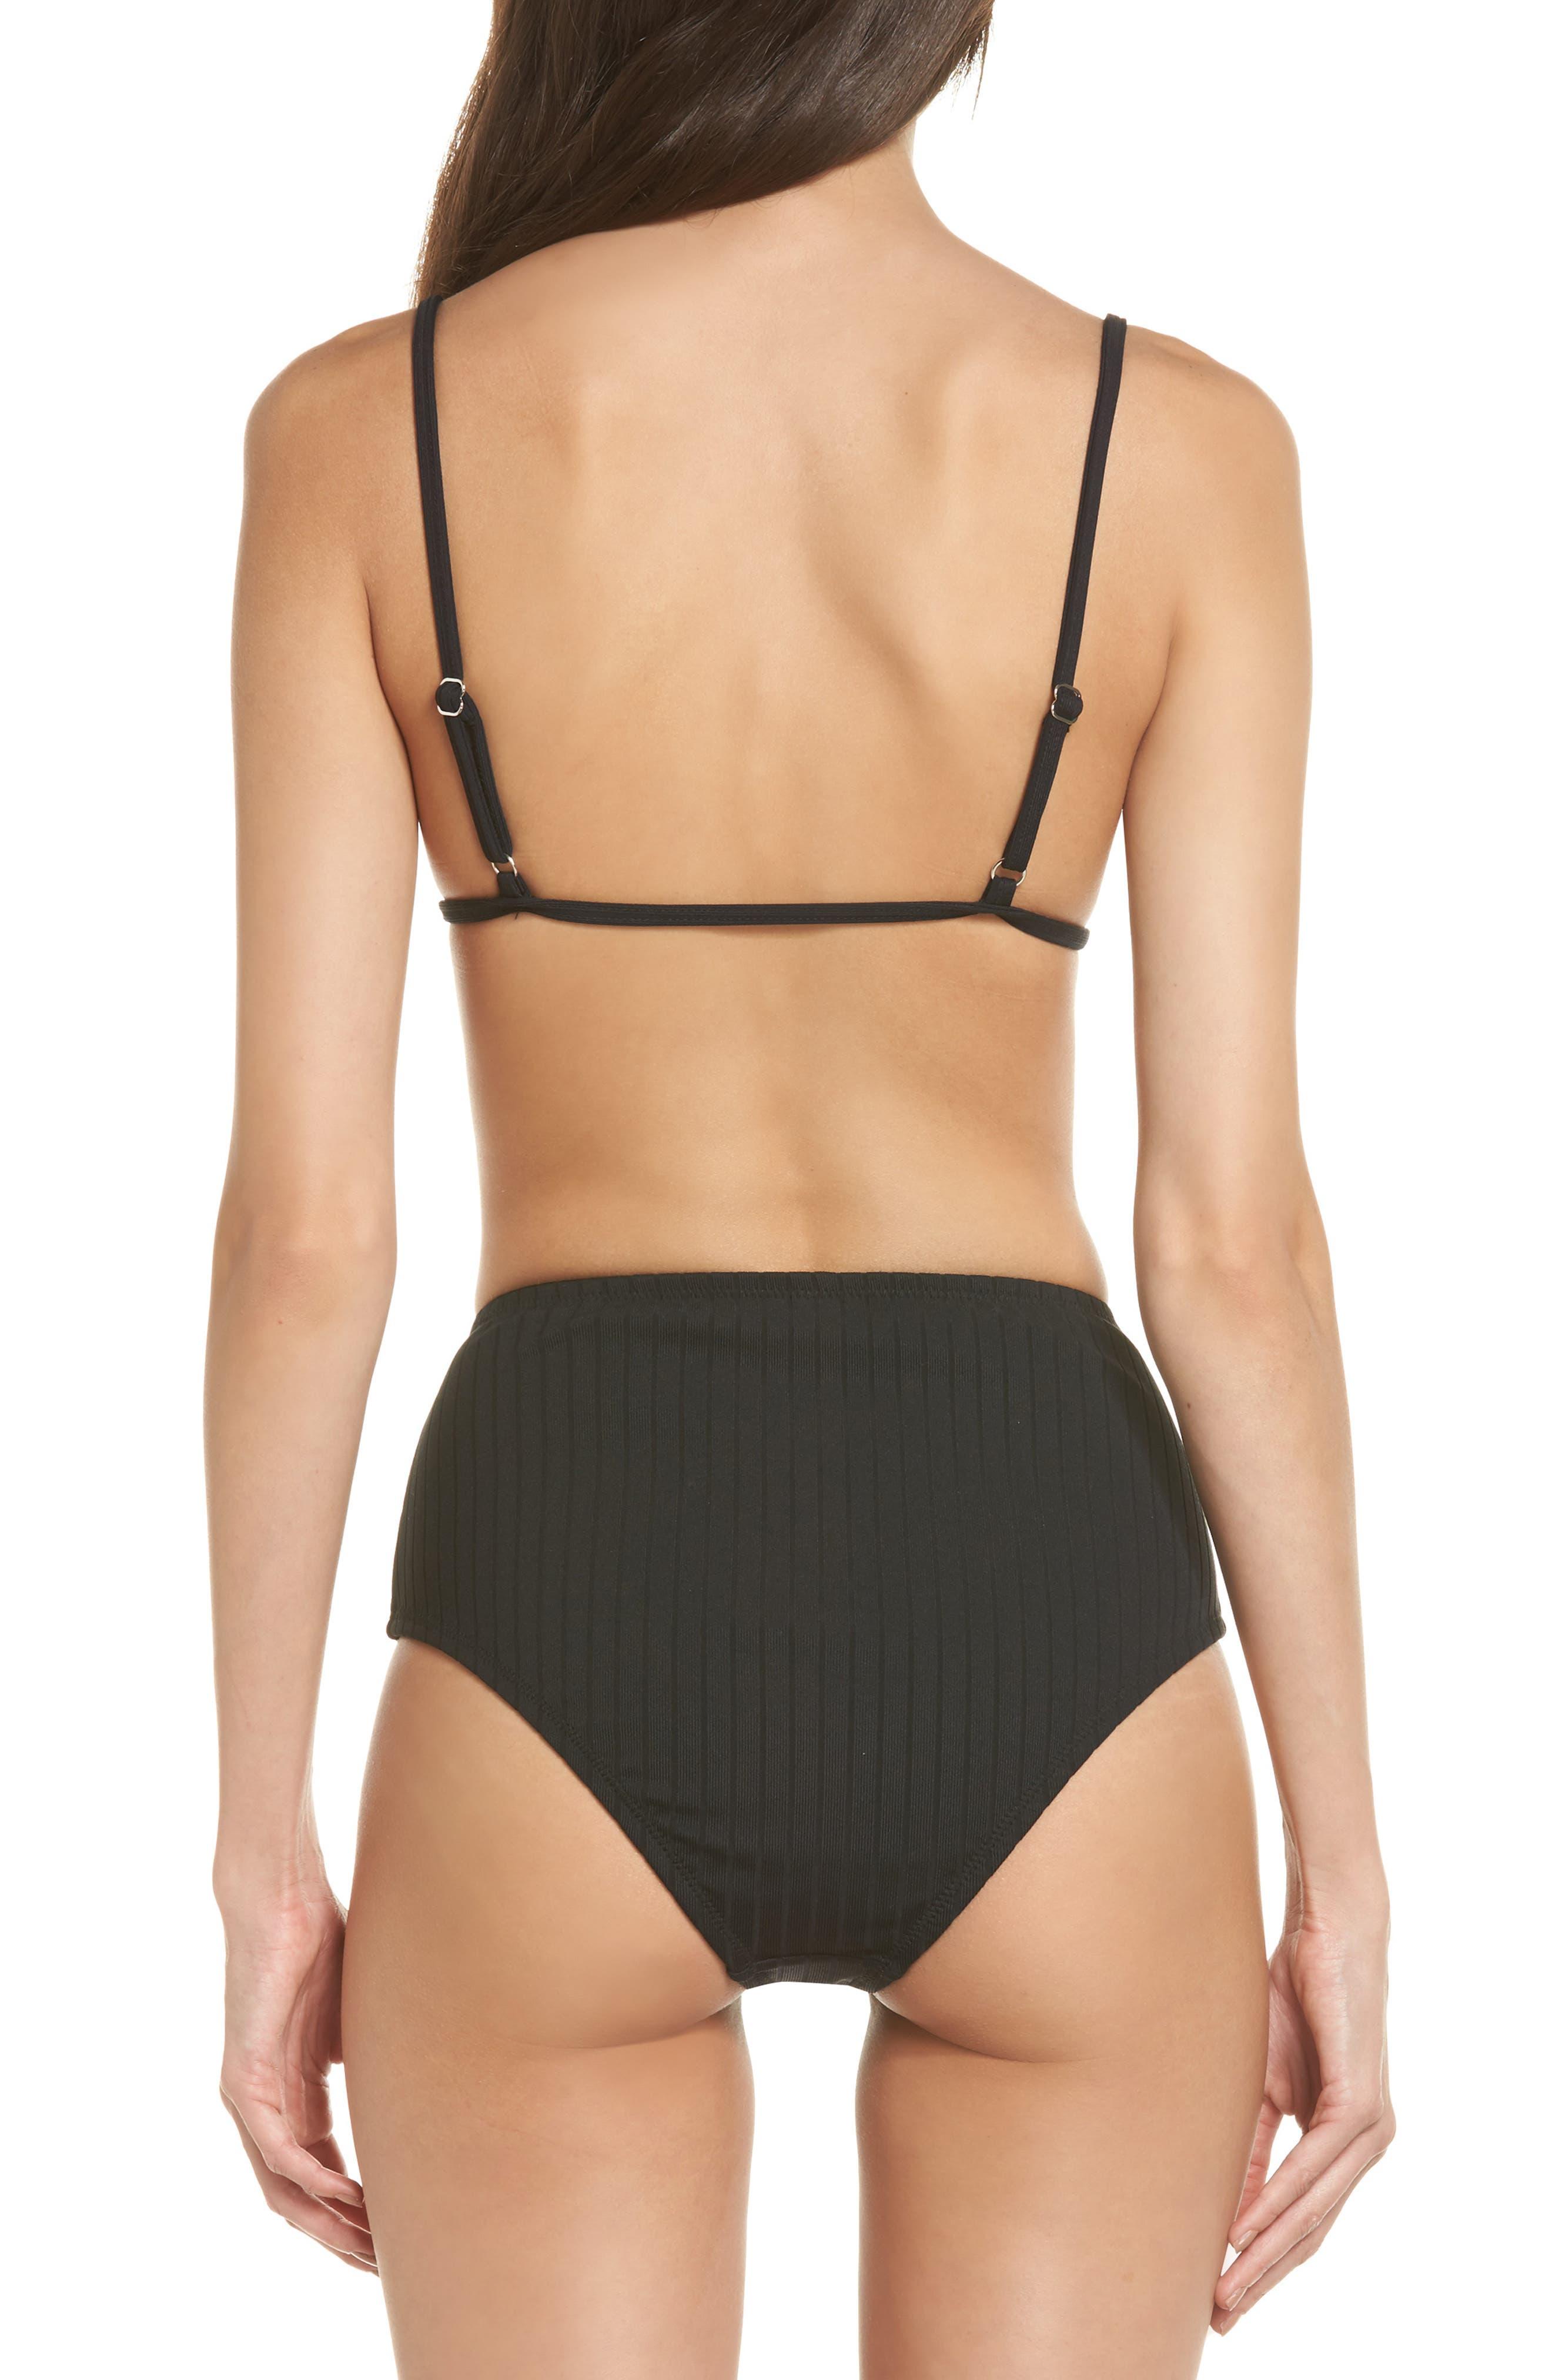 Westwood High Waist Bikini Bottoms,                             Alternate thumbnail 8, color,                             001